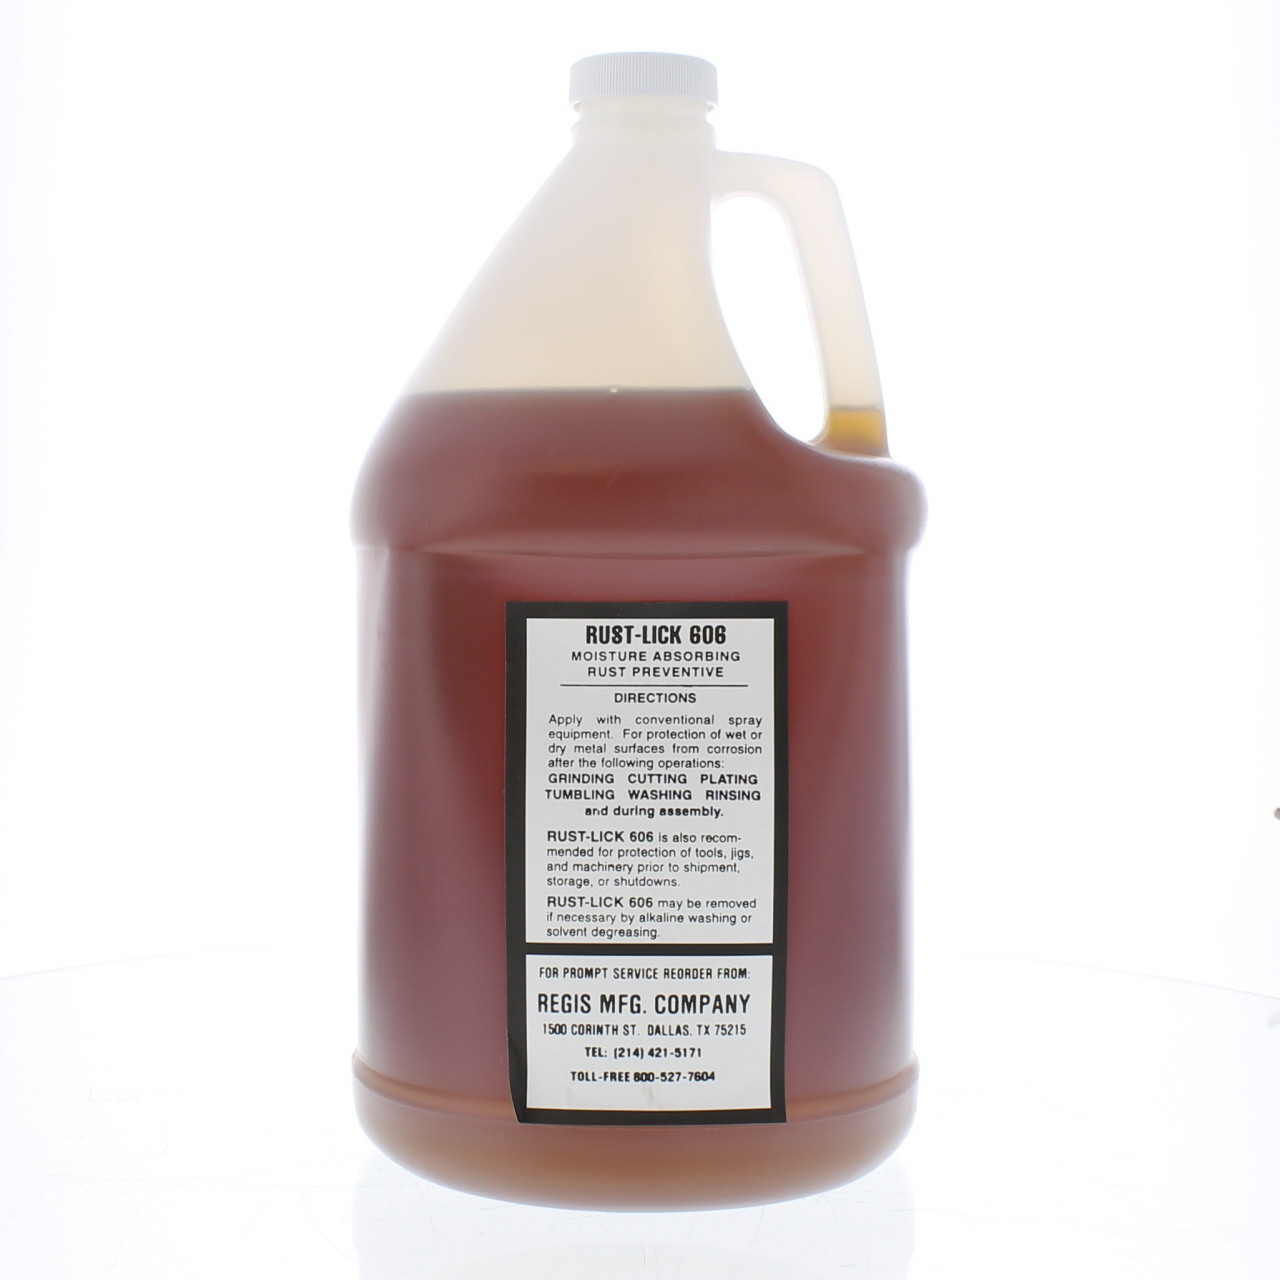 Rust Proofing Spray Rustlick 606 - 1 Gallon - REGIS